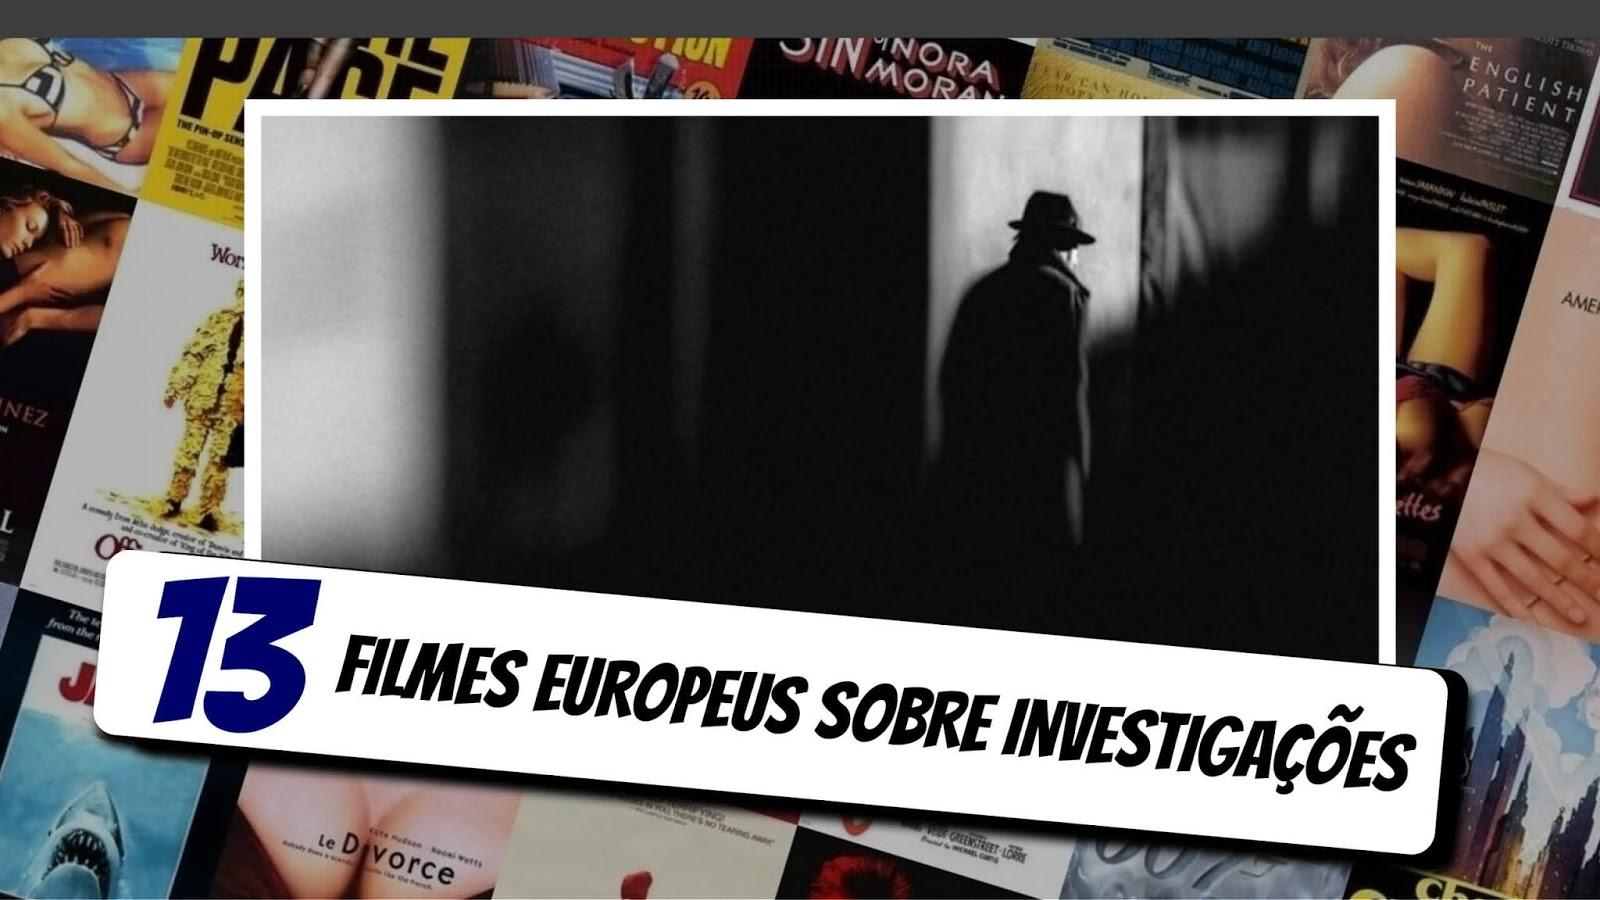 13-filmes-europeus-sobre-investigacoes